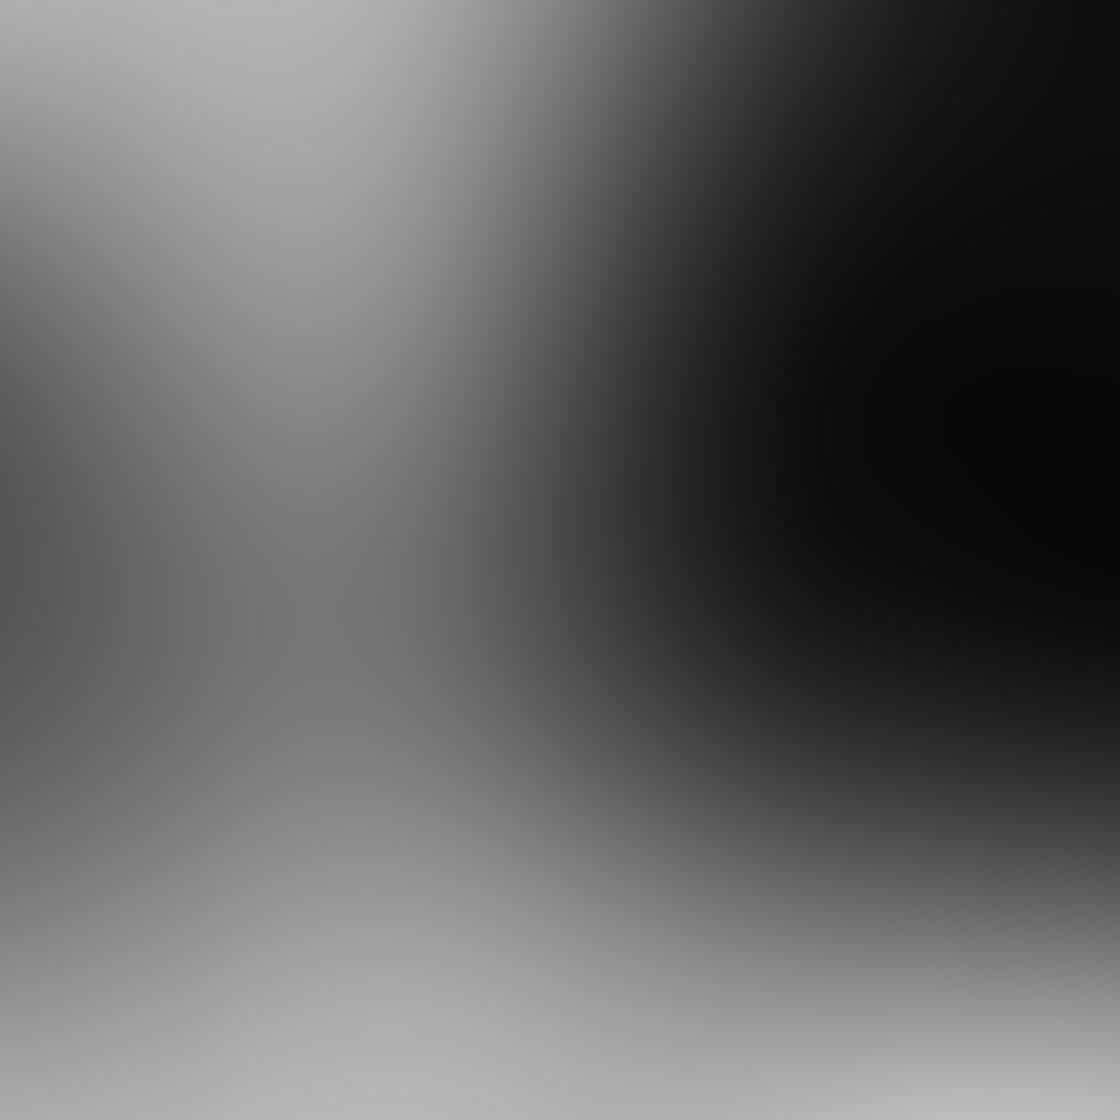 iPhone Portrait Photography 1